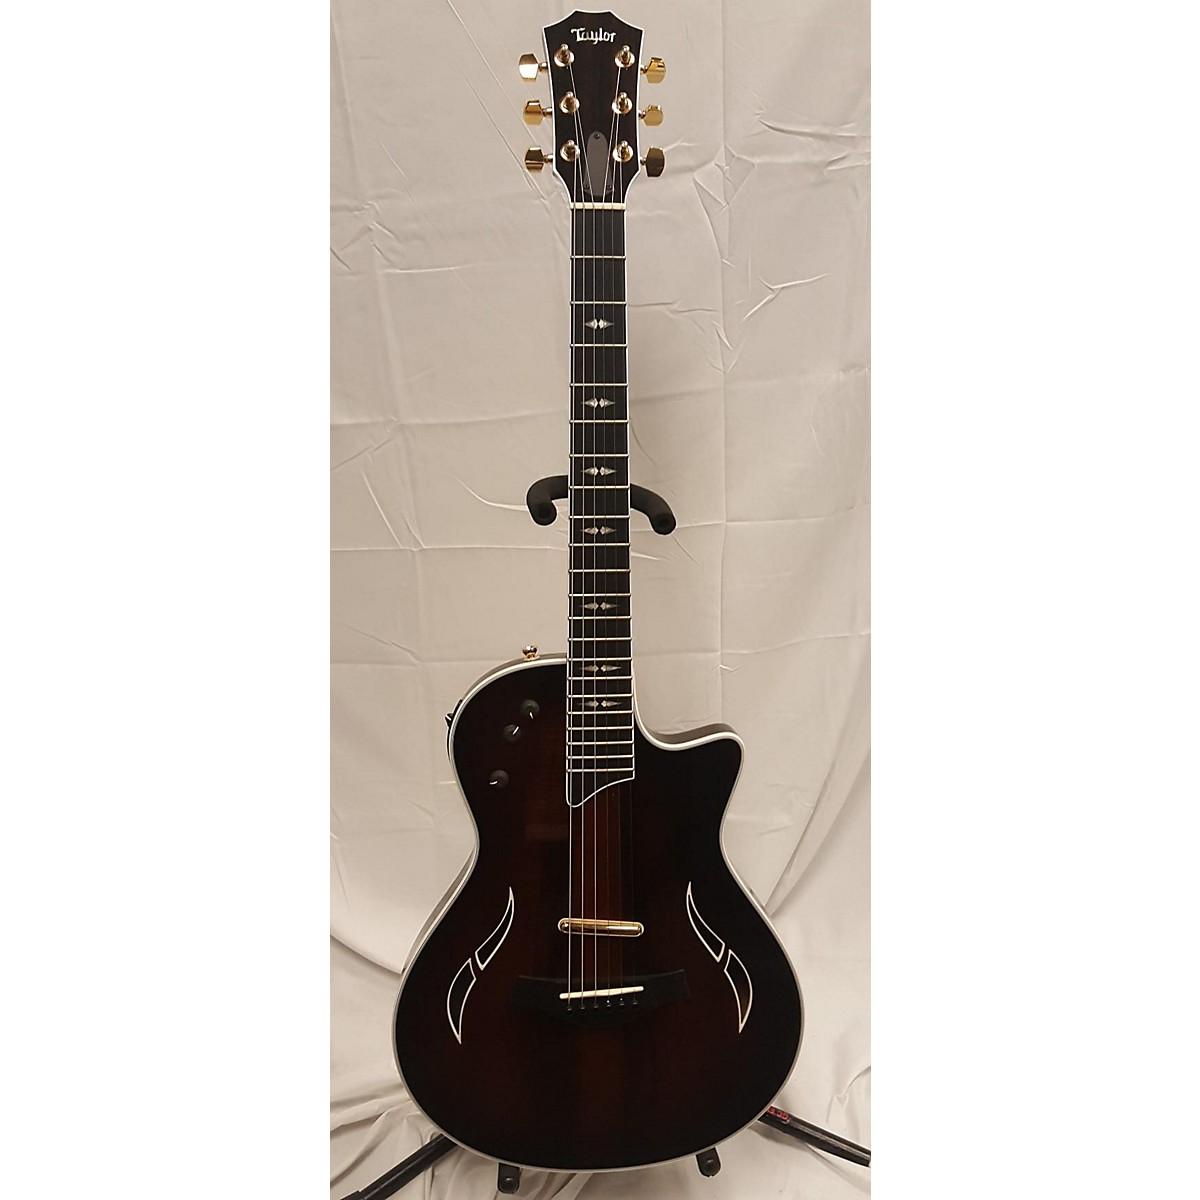 Taylor 2017 T5Z Custom Koa Hollow Body Electric Guitar